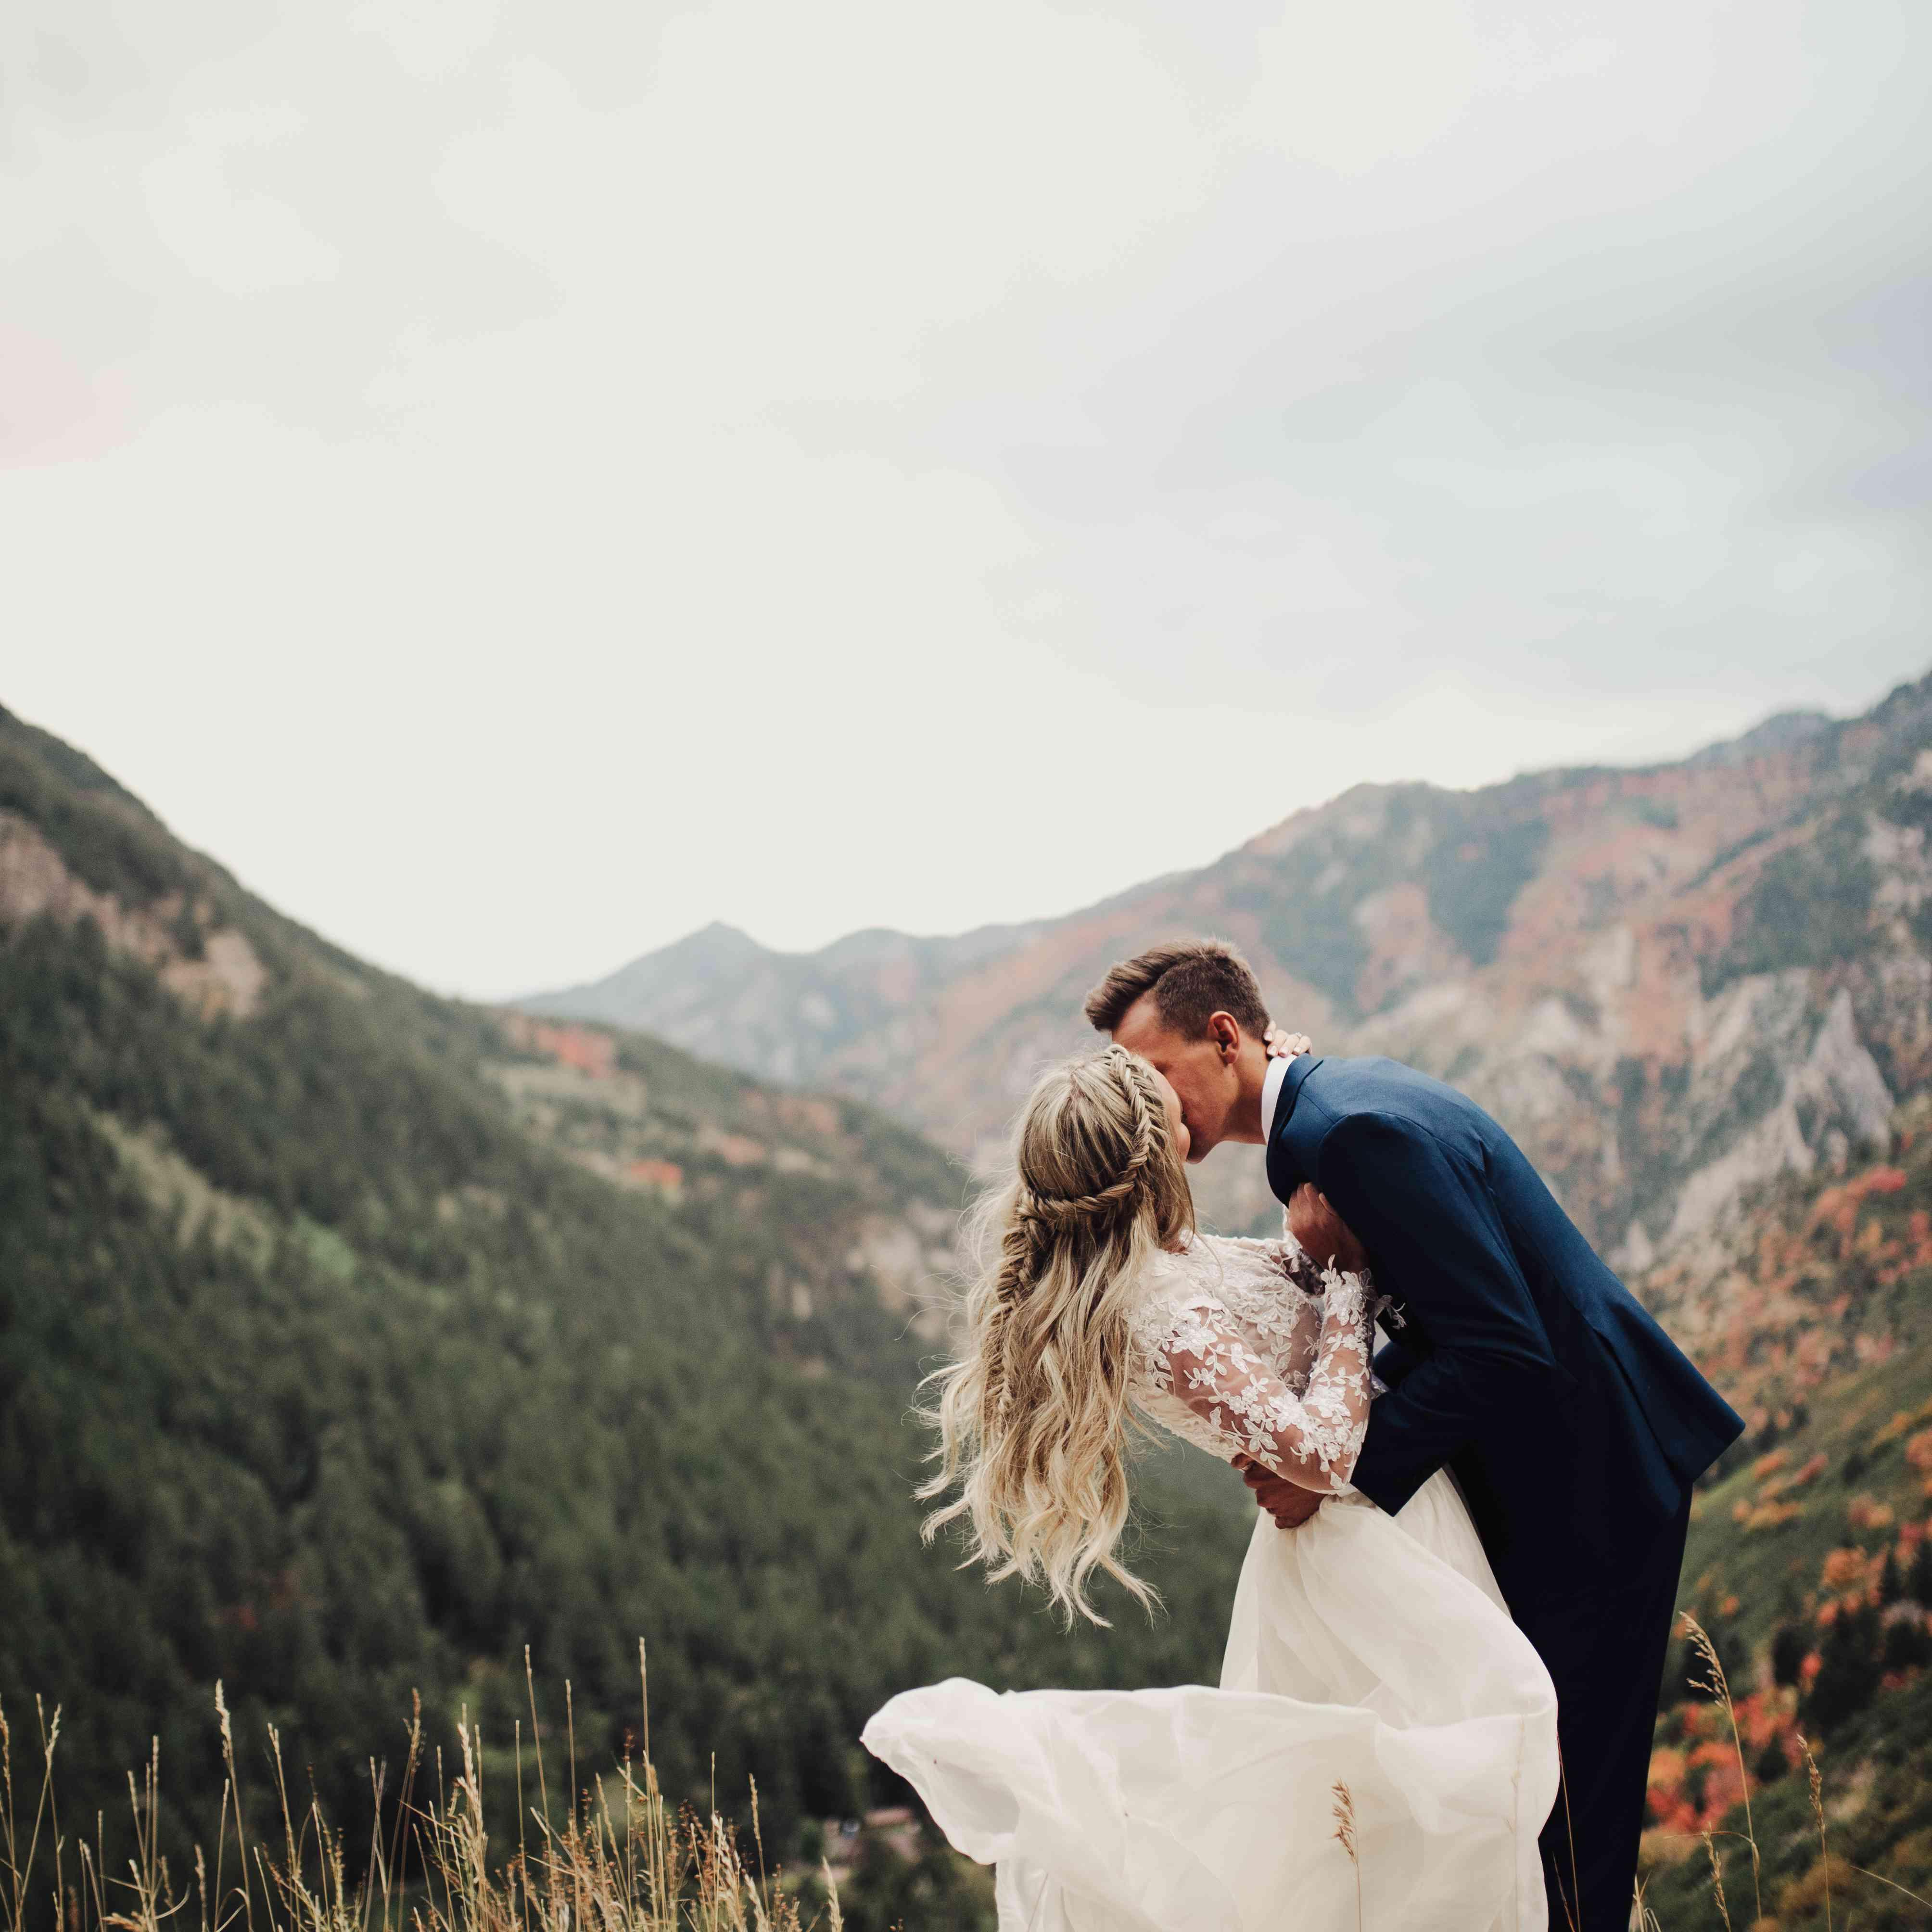 Bride in Billowing Wedding Dress